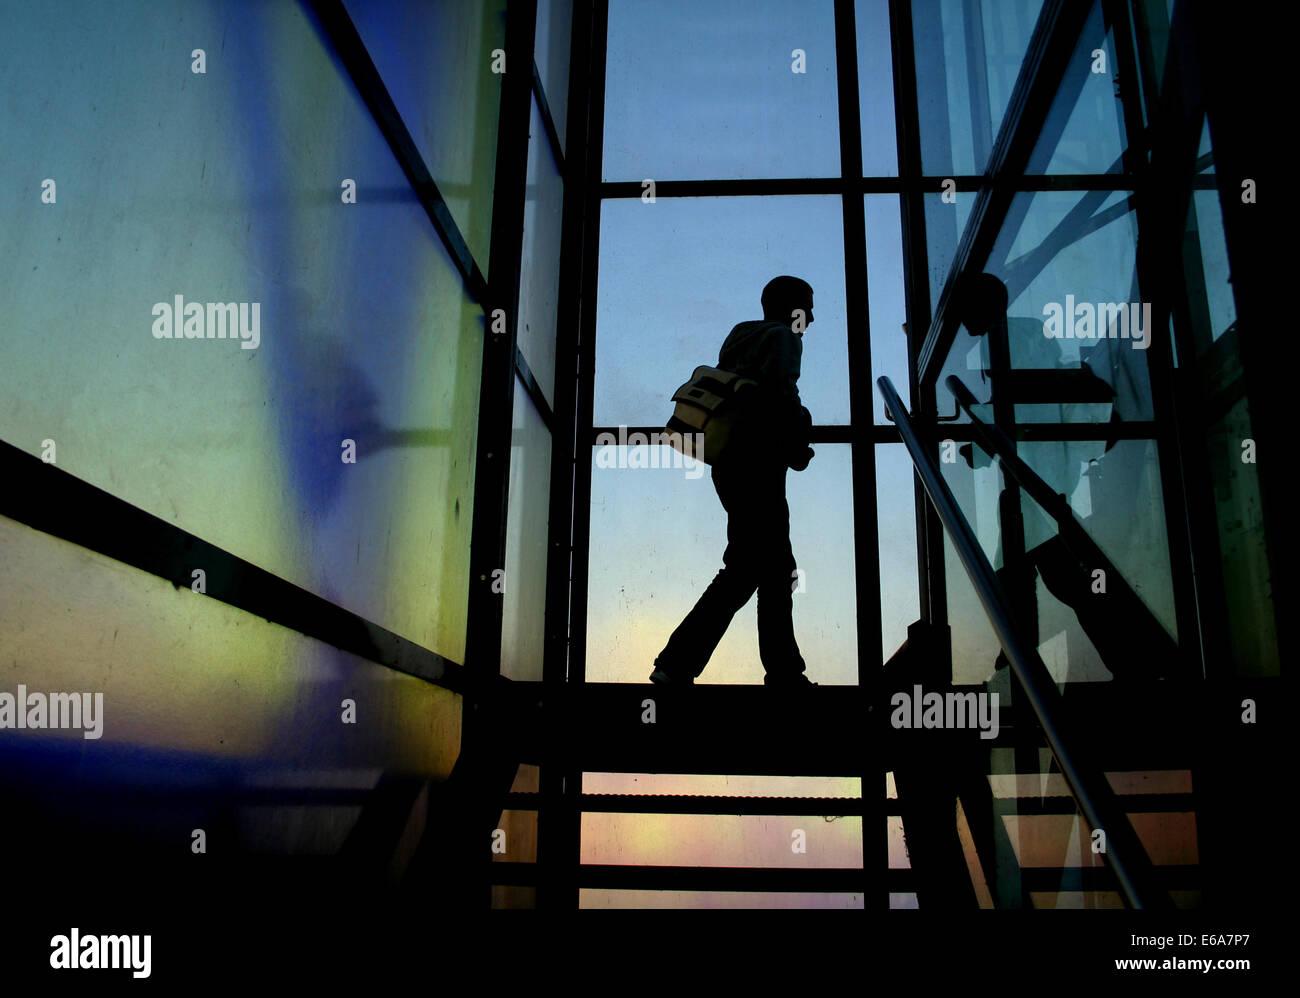 man,stairway - Stock Image